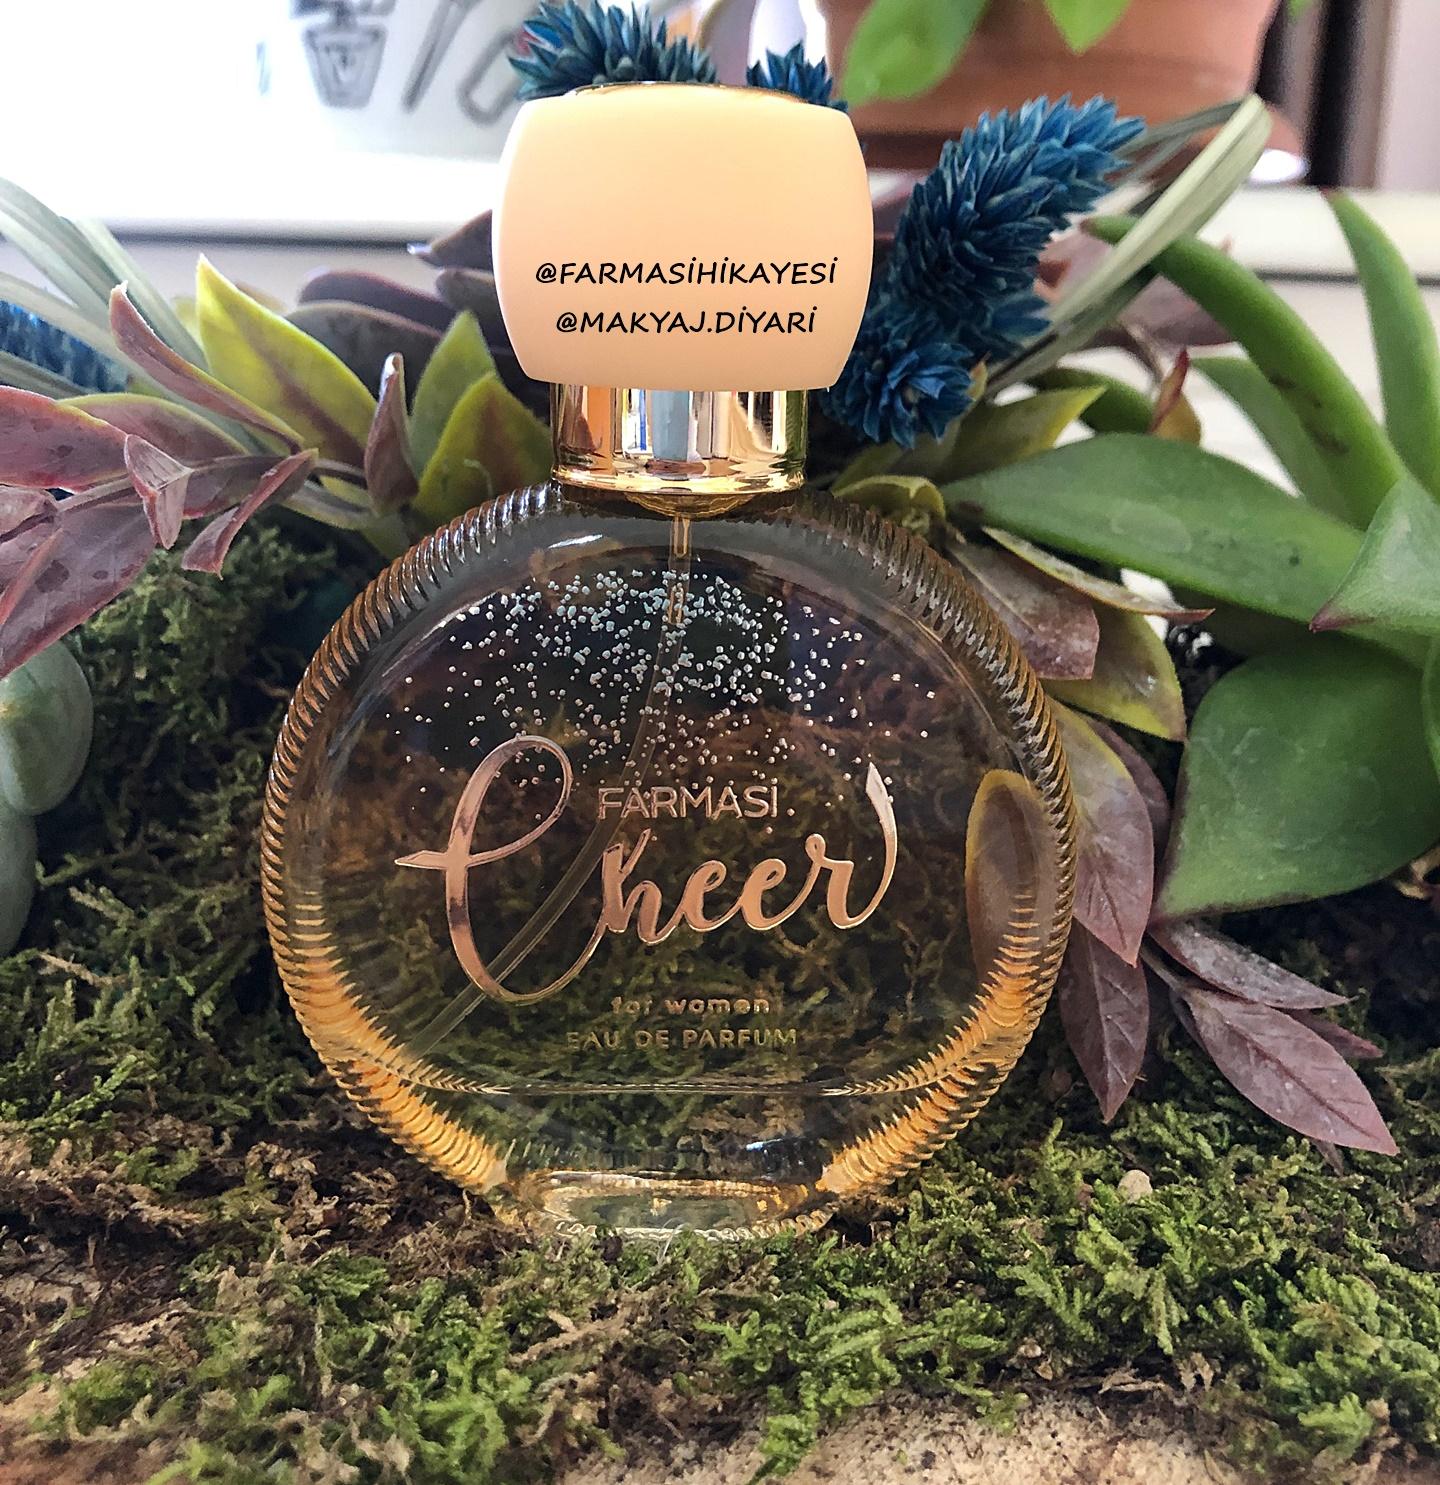 farmasi-cheer-kadin-parfum